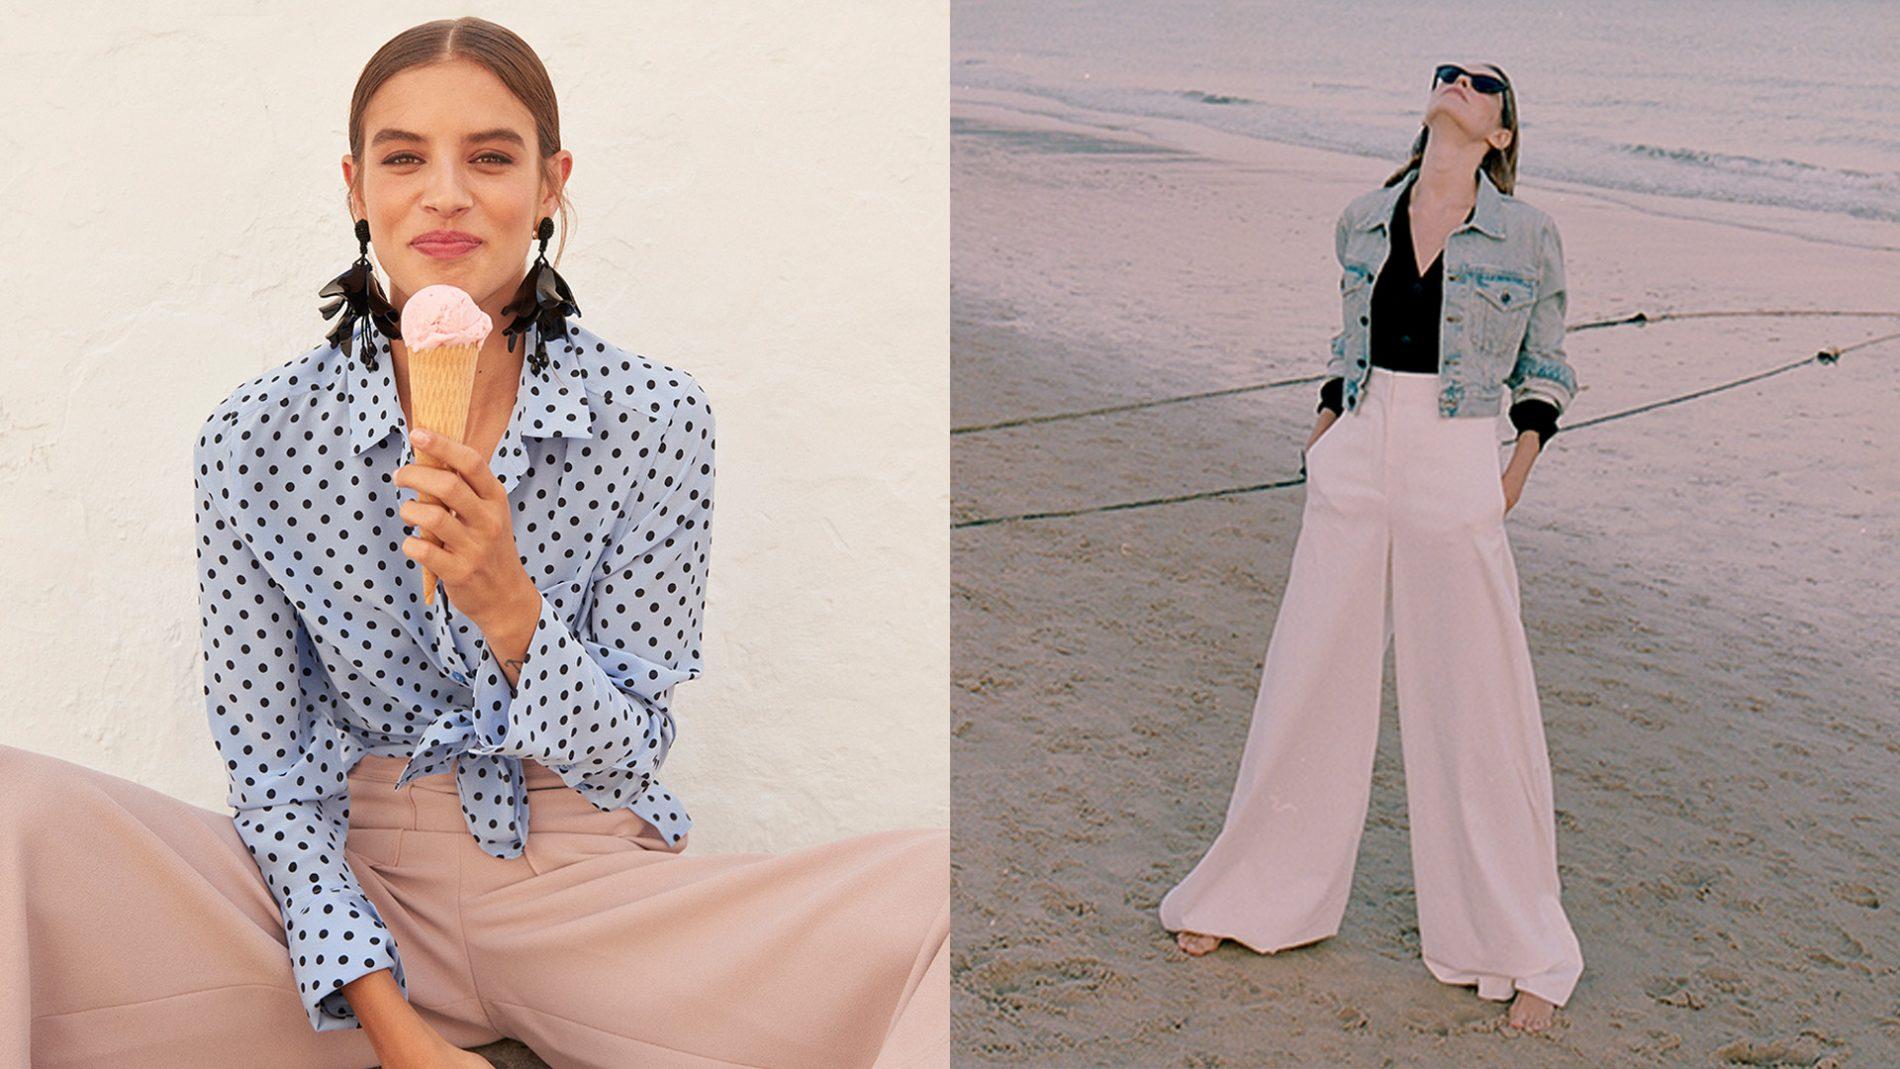 El Corte Inglés Ready-To-Wear Sunglasses Emilio Pucci Alexander Wang Rag & Bone Moschino See By Chloe